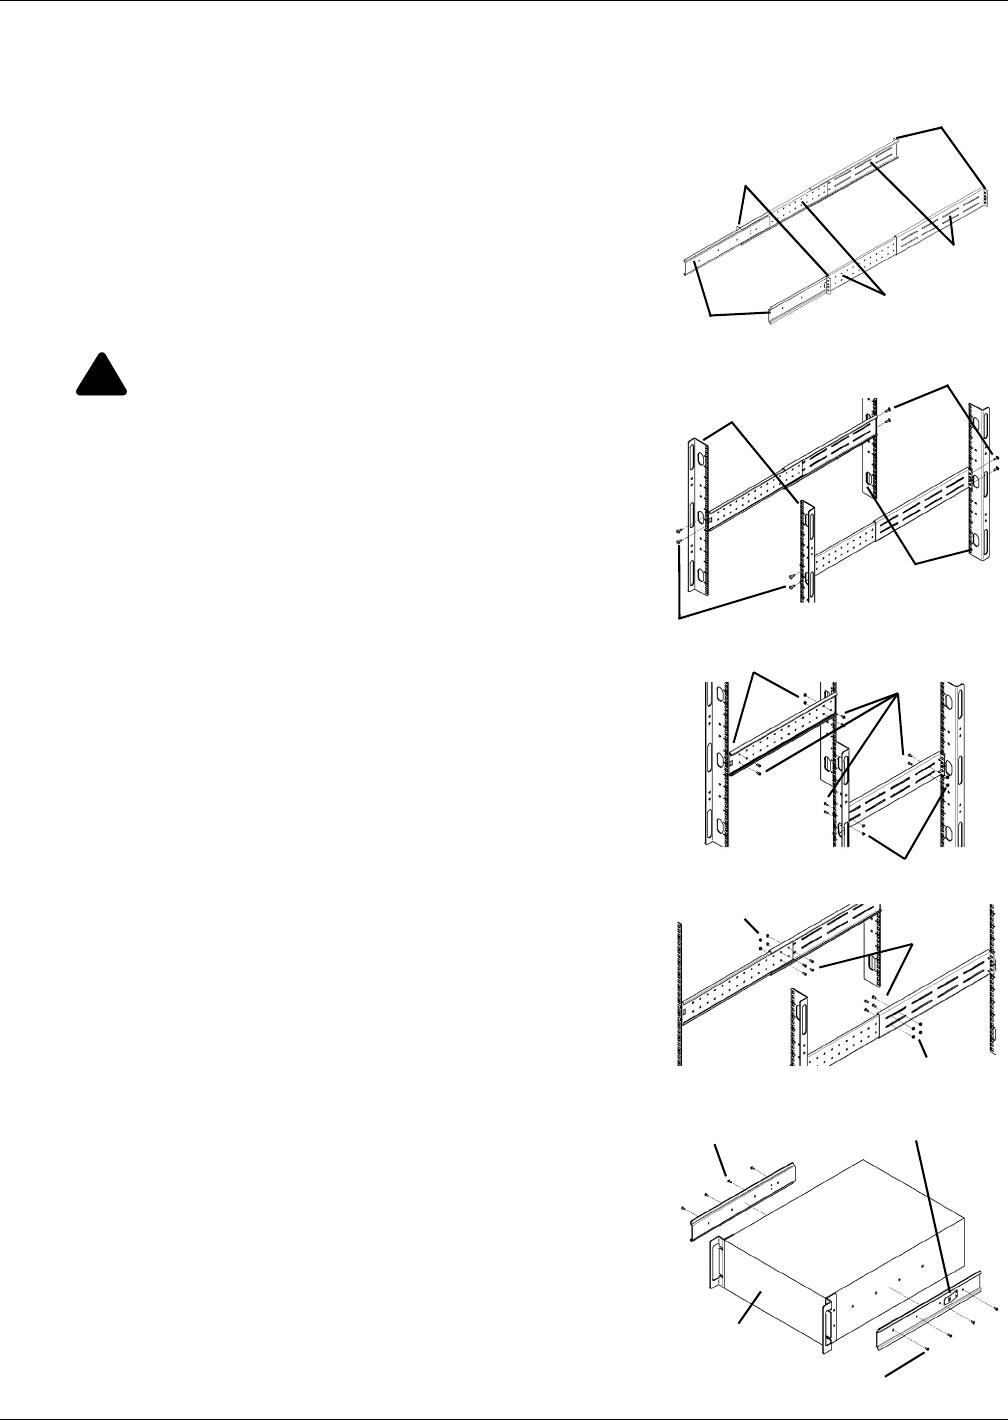 Emerson Liebert Gxt3 230V 5000Va Ul Listed Users Manual